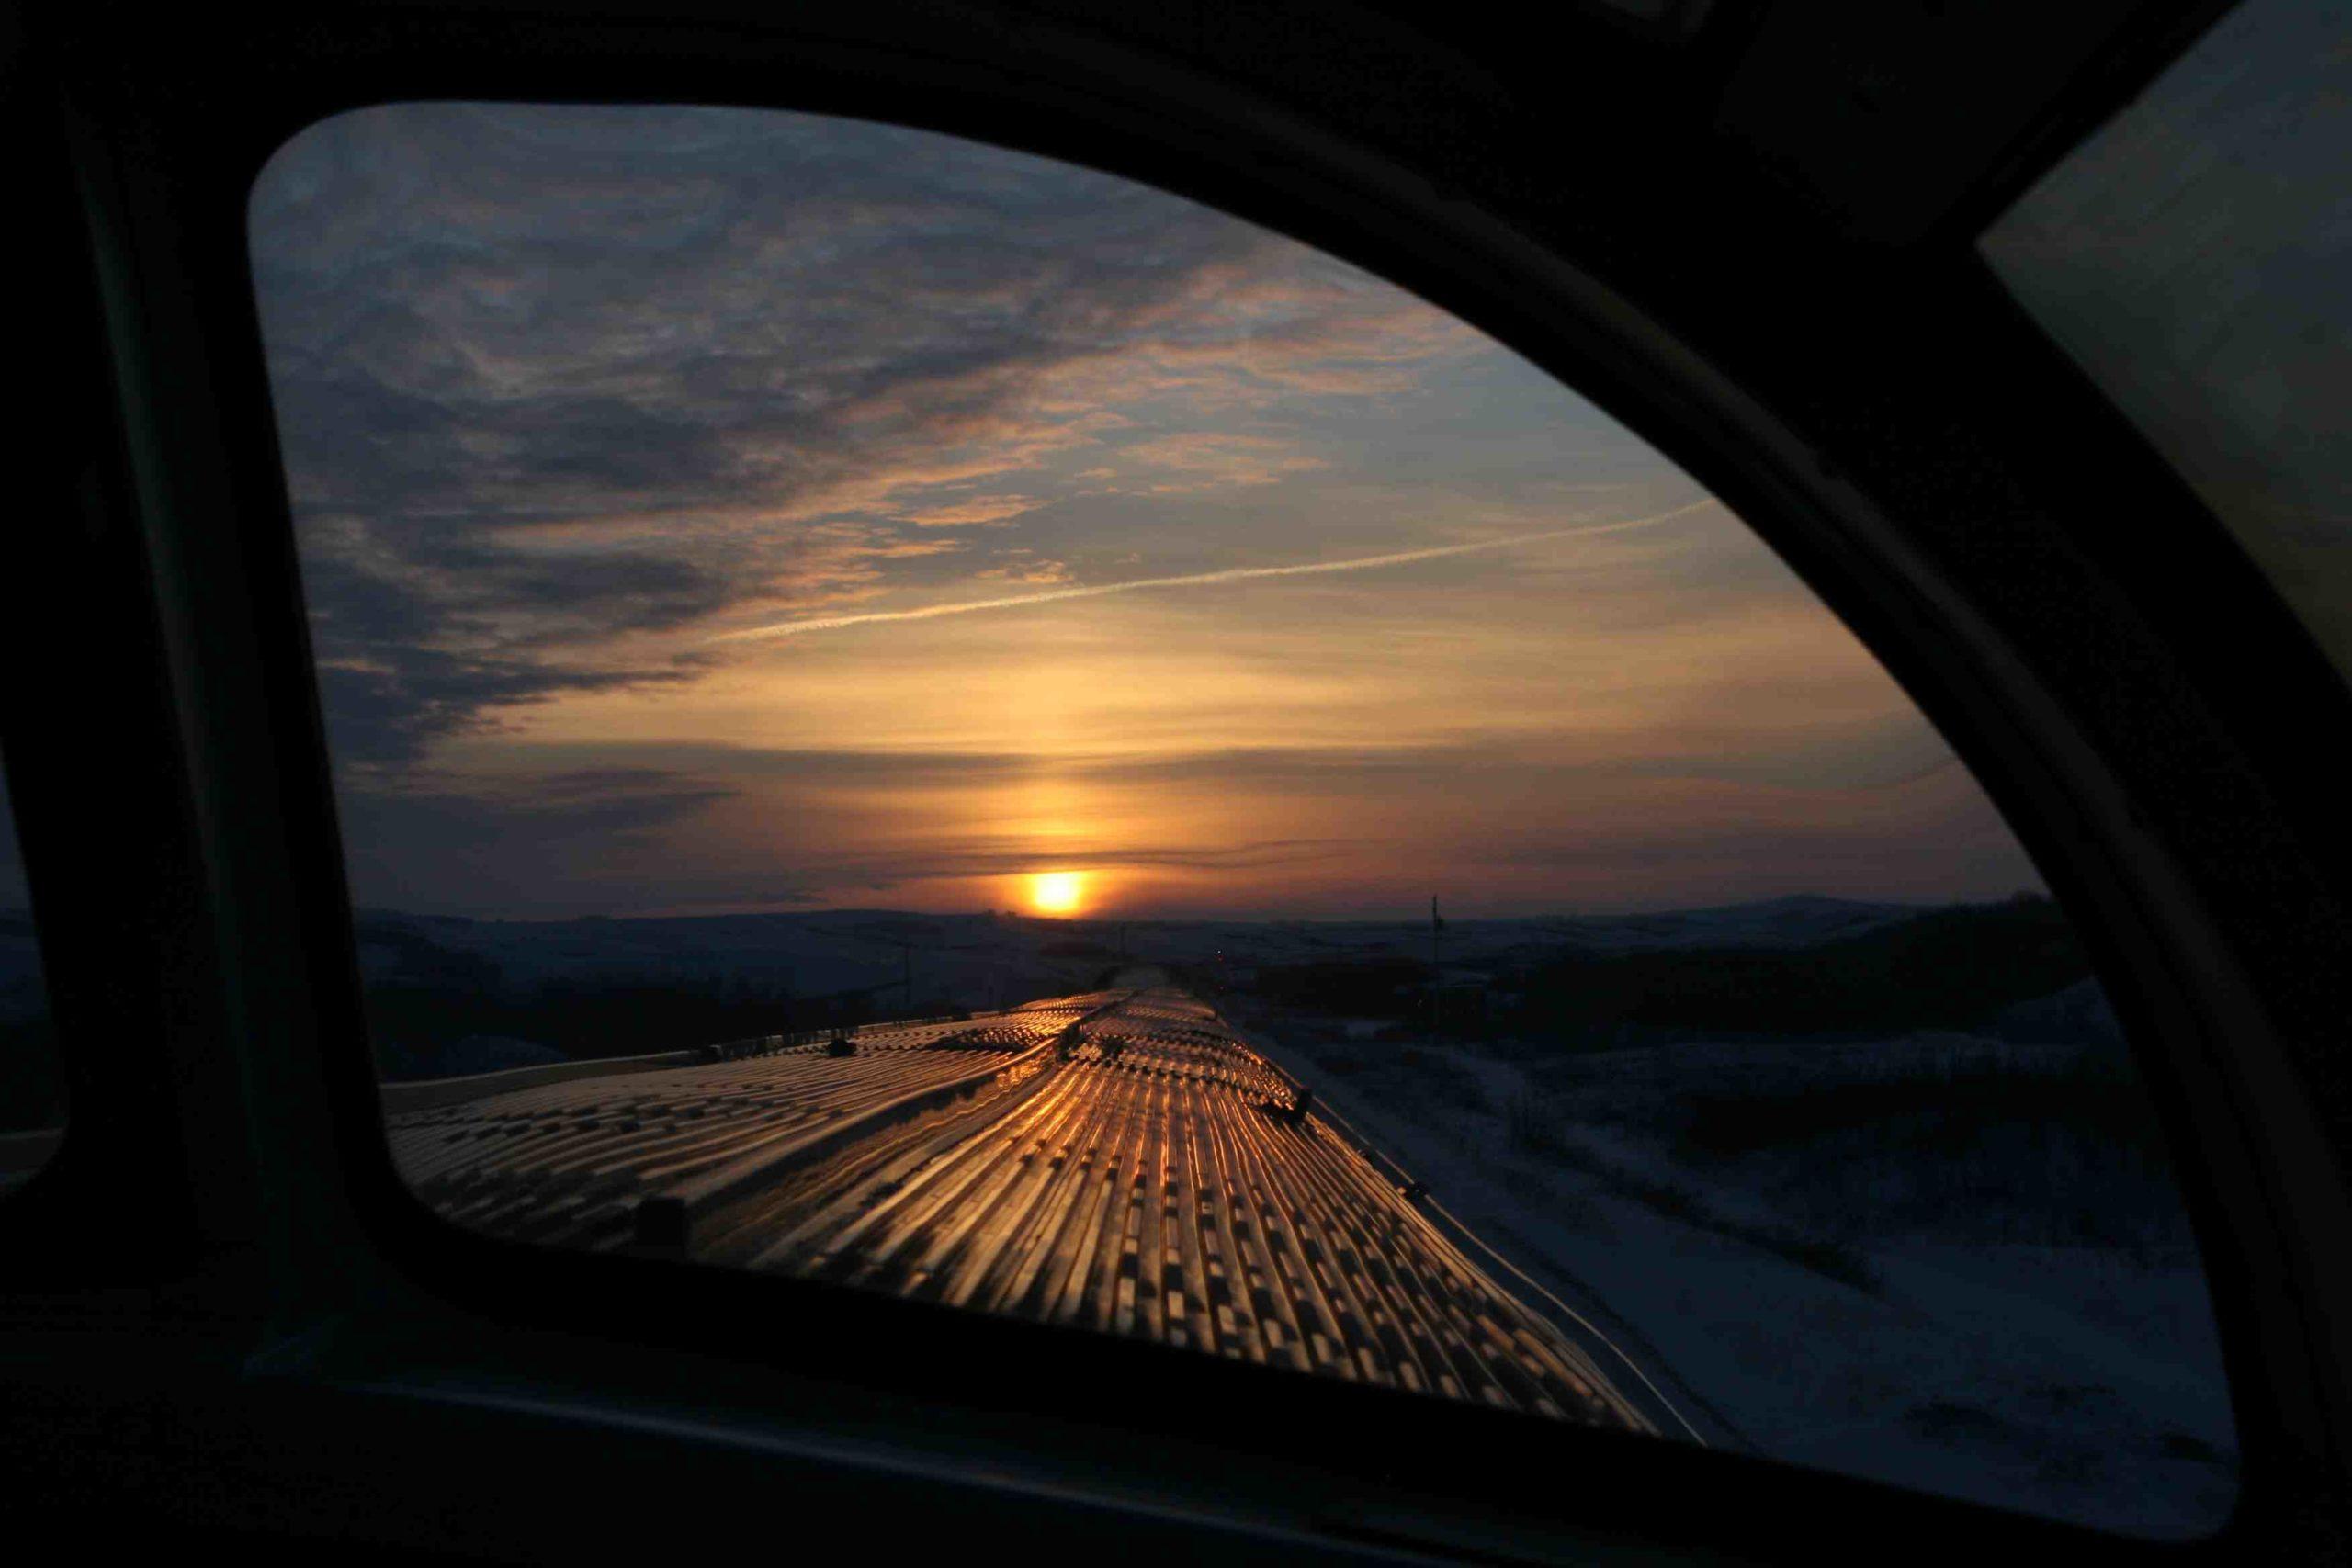 Sunrise on the Canadian - 1/11/11